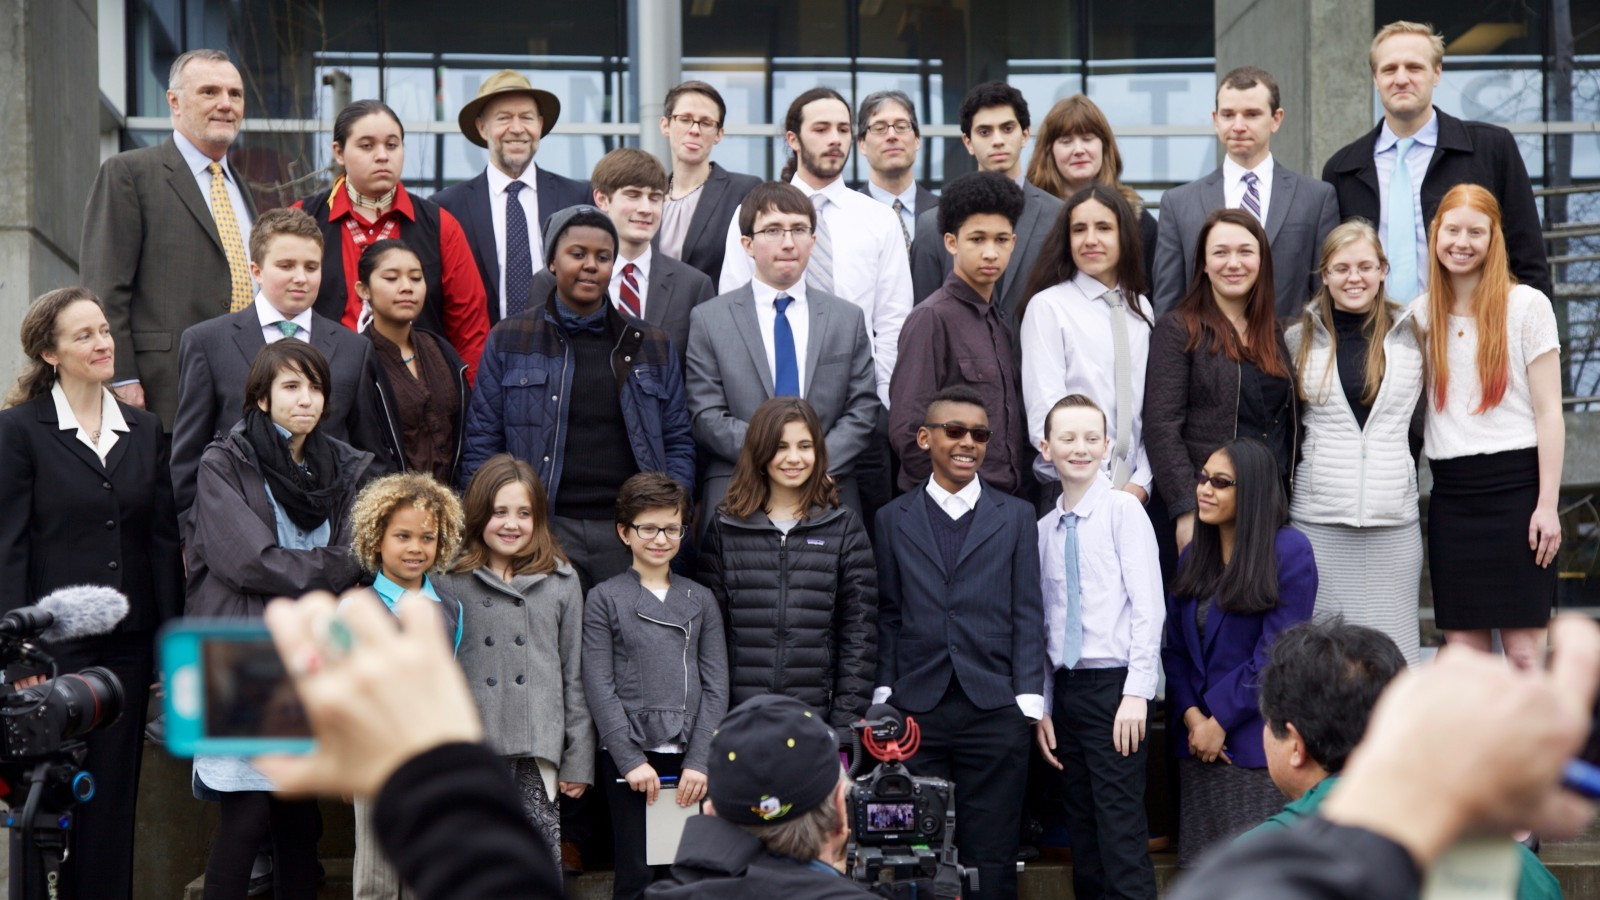 21 youth plaintiffs in Eugene, Ore.